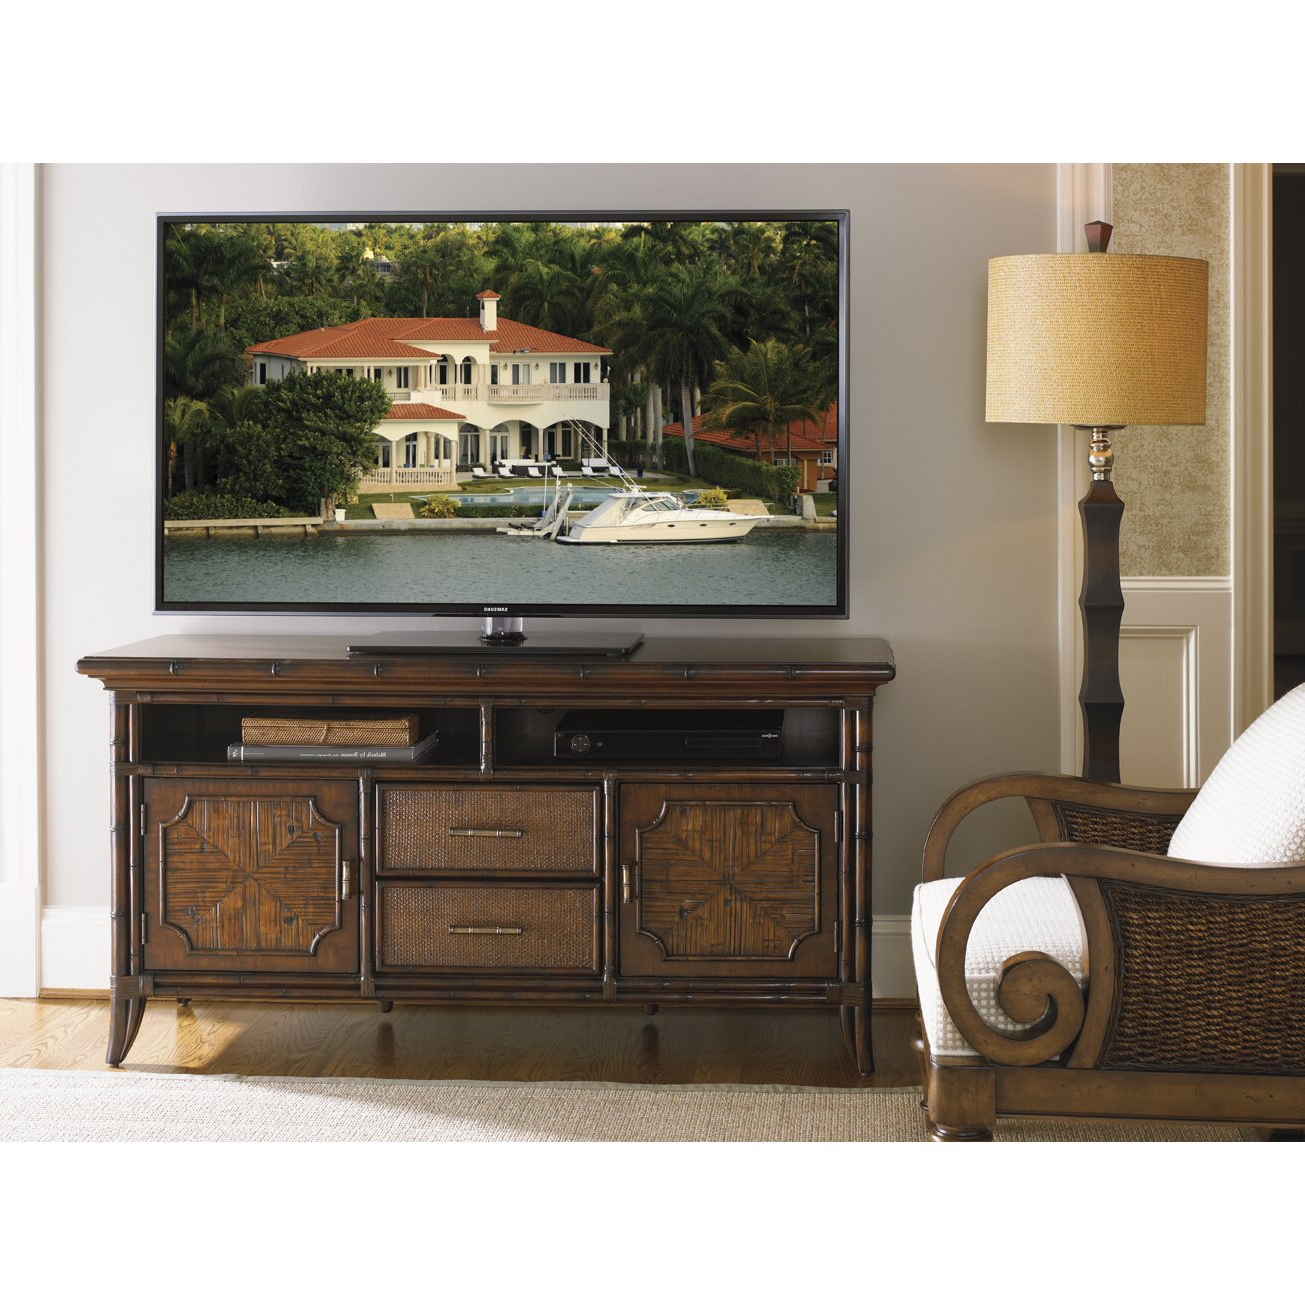 Sligh Bal Harbor Crystal Bay Tv Stand   Wayfair Regarding Harbor Wide Tv Stands (View 6 of 20)